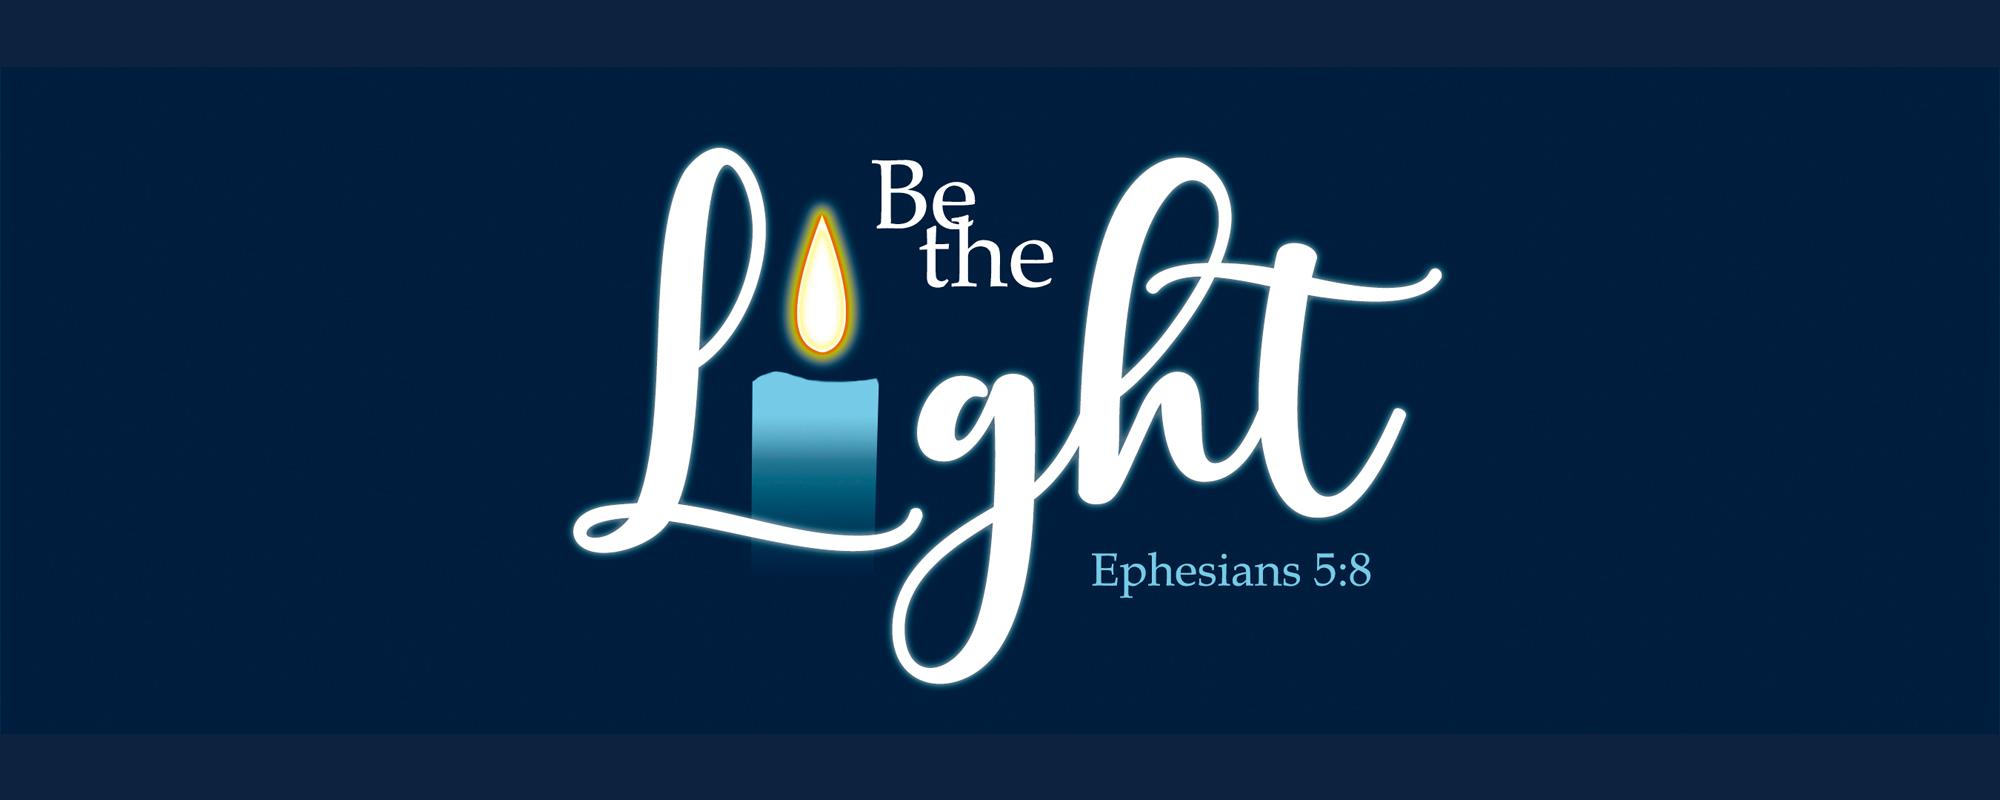 Be the light Ephesians 5:8